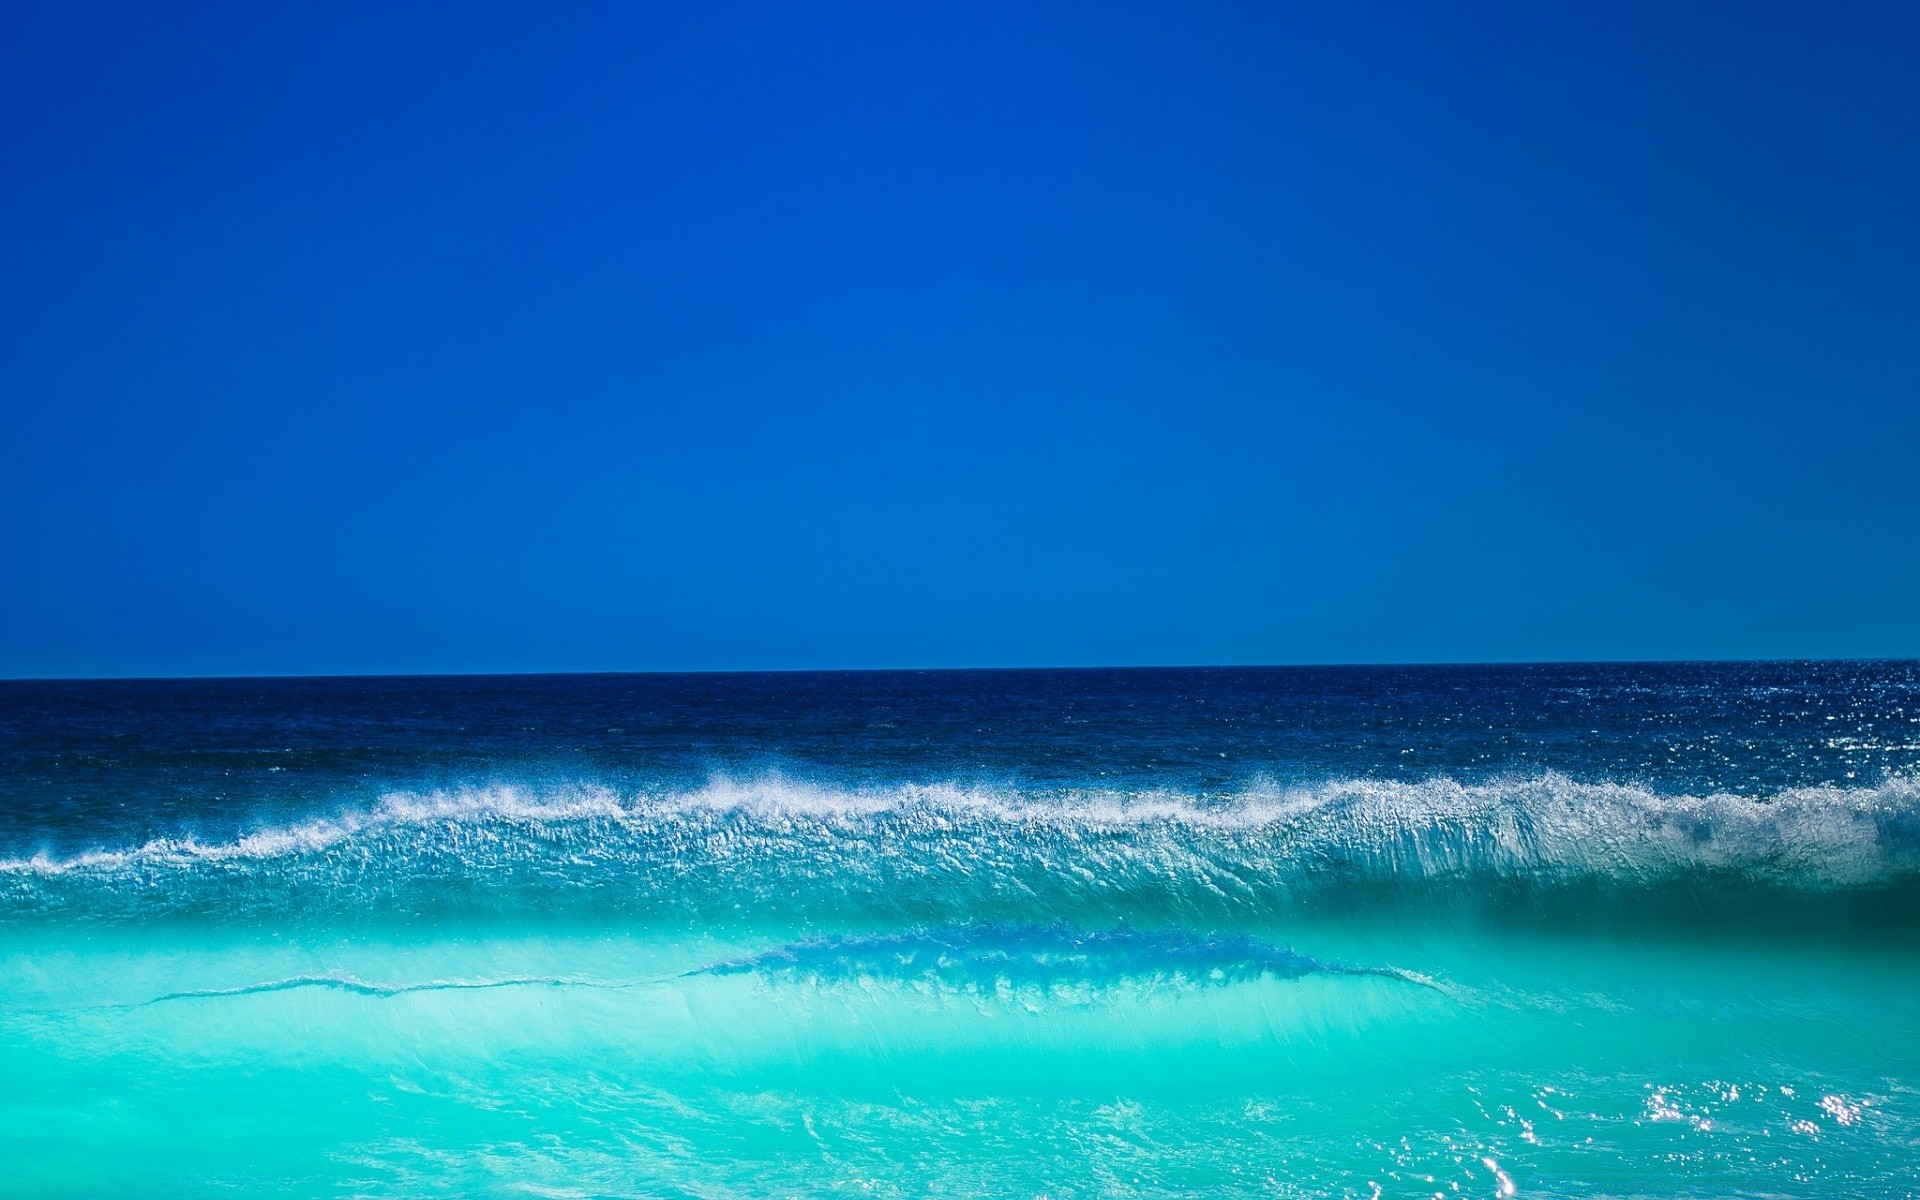 Картинки в синем цвете море